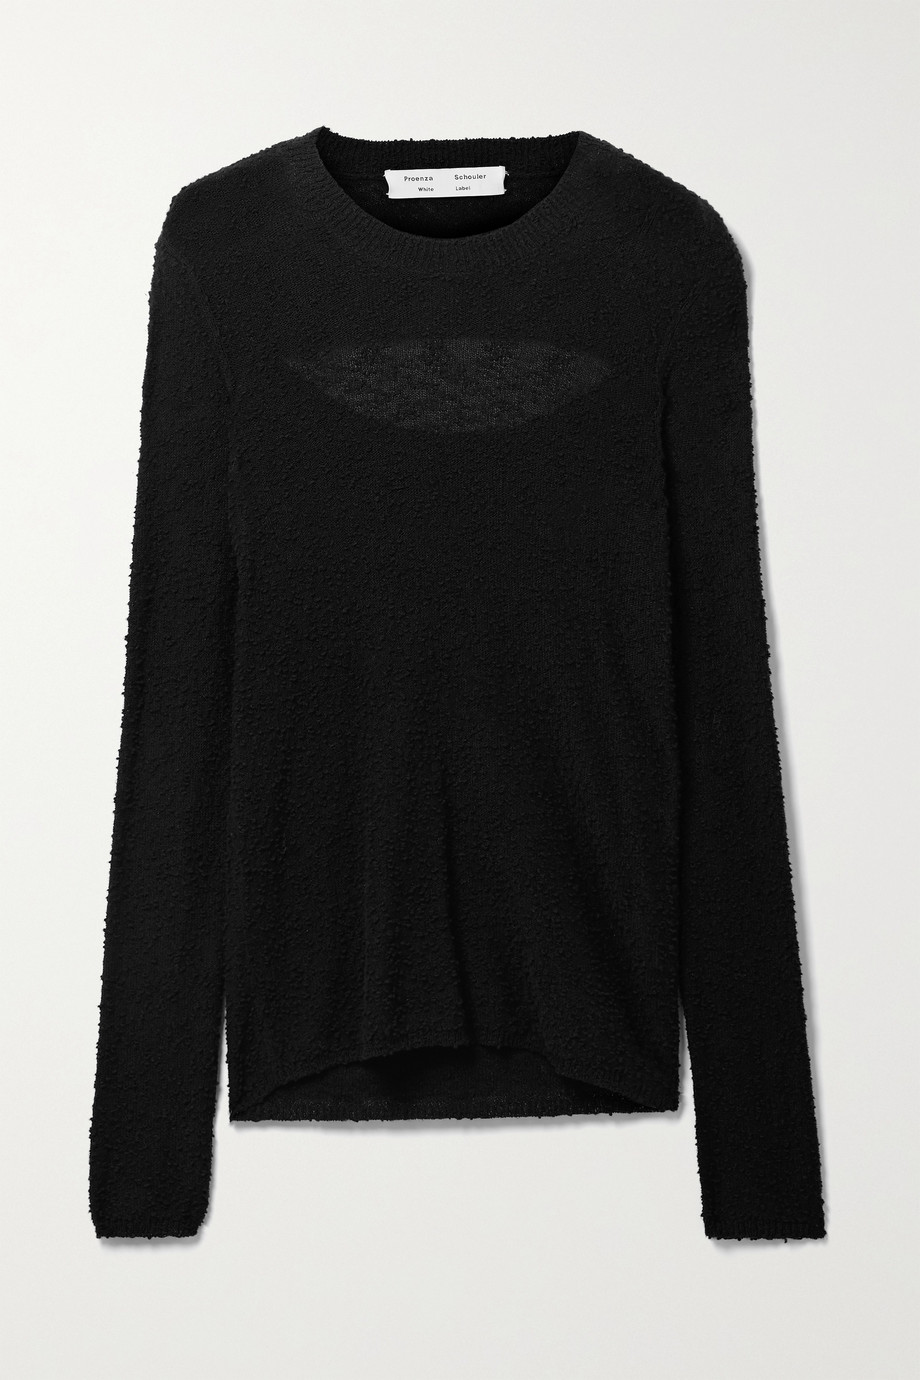 Proenza Schouler White Label Cutout bouclé sweater